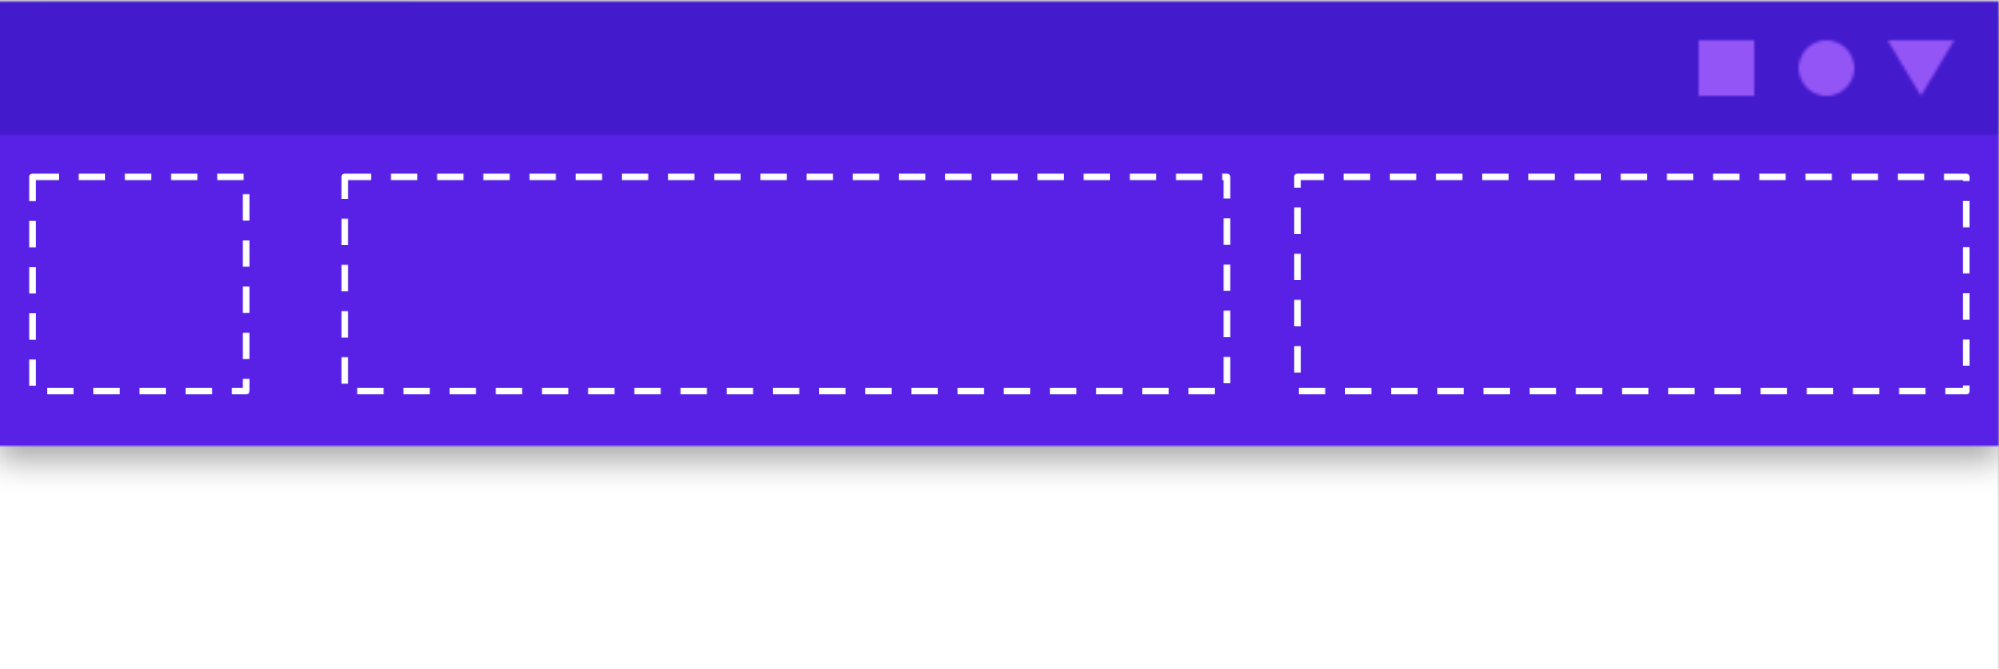 显示 Material Components 应用栏中的可用槽位的图表